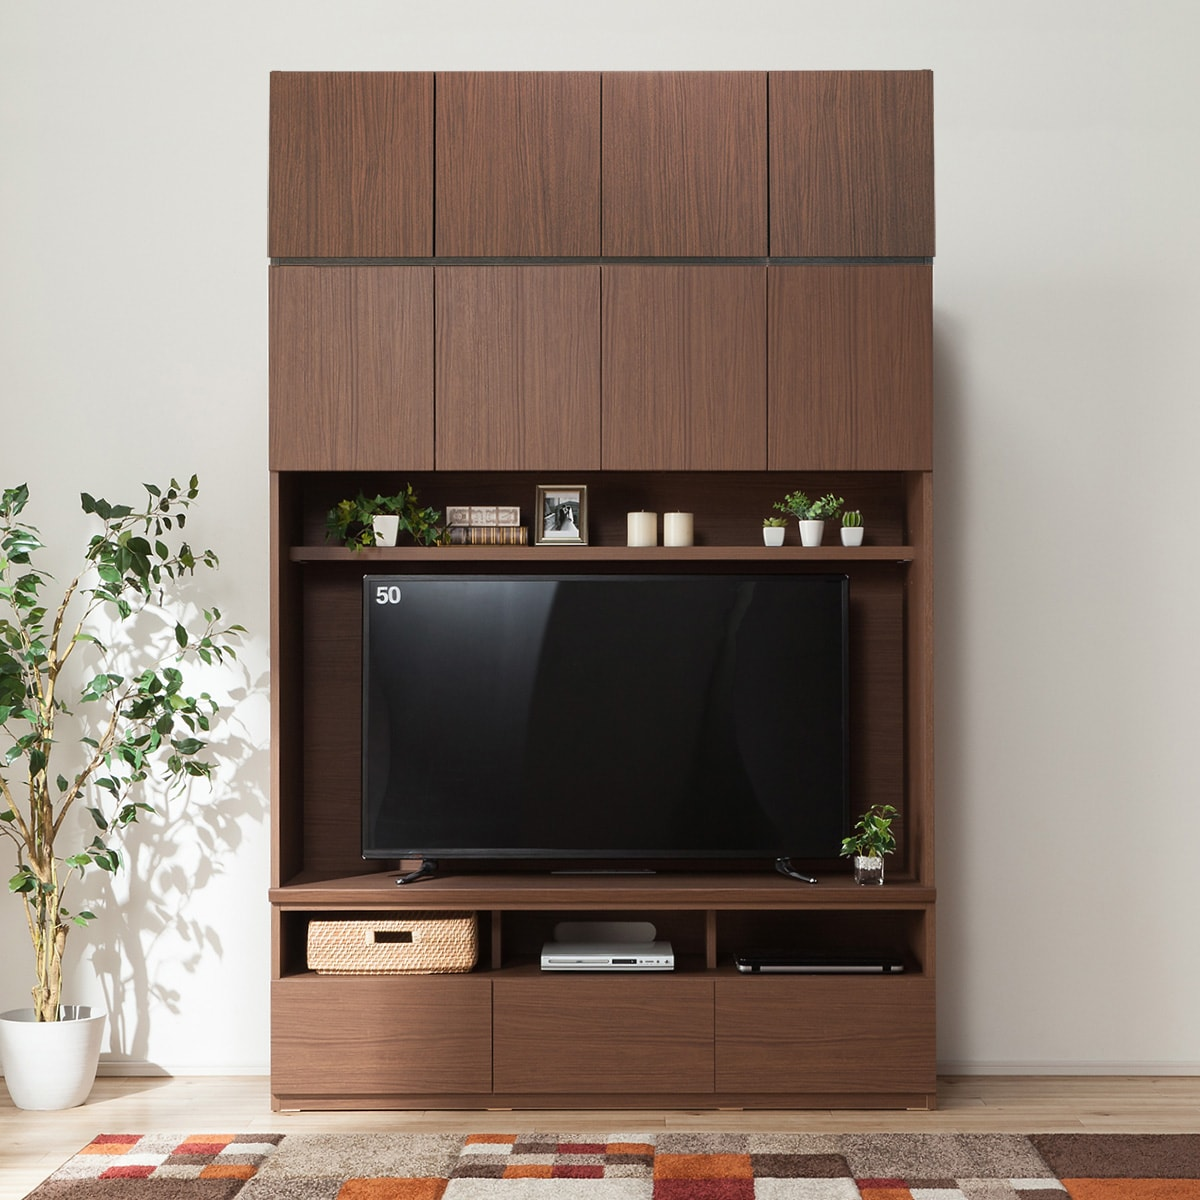 TVボード上置セット(ポルテ150TV MBR/上置 ポルテ150U MBR) ニトリ 【配送員設置】 【5年保証】